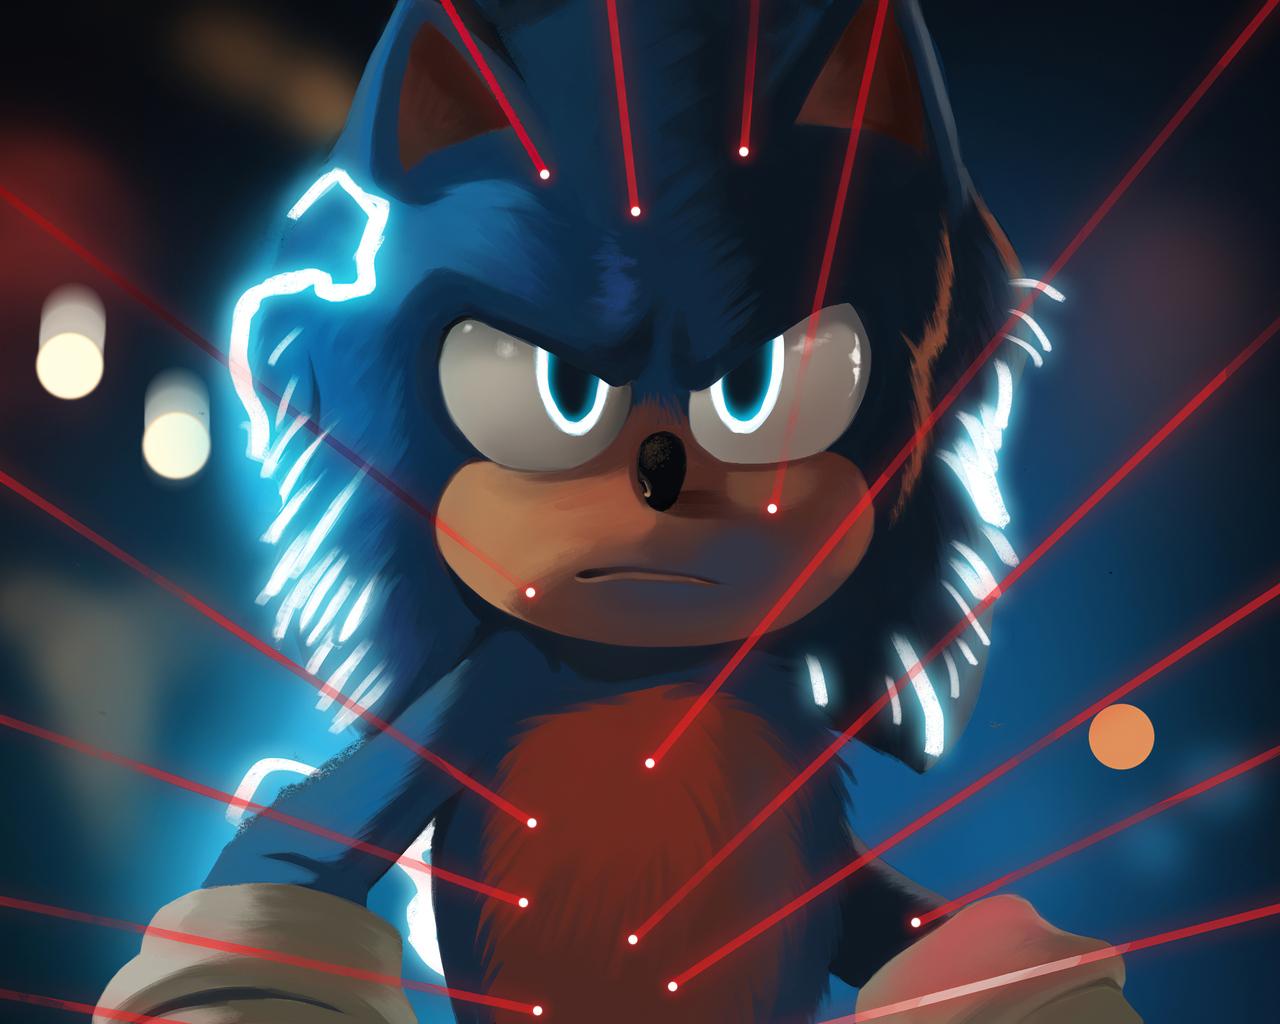 sonic-the-hedgehogart2020-0l.jpg